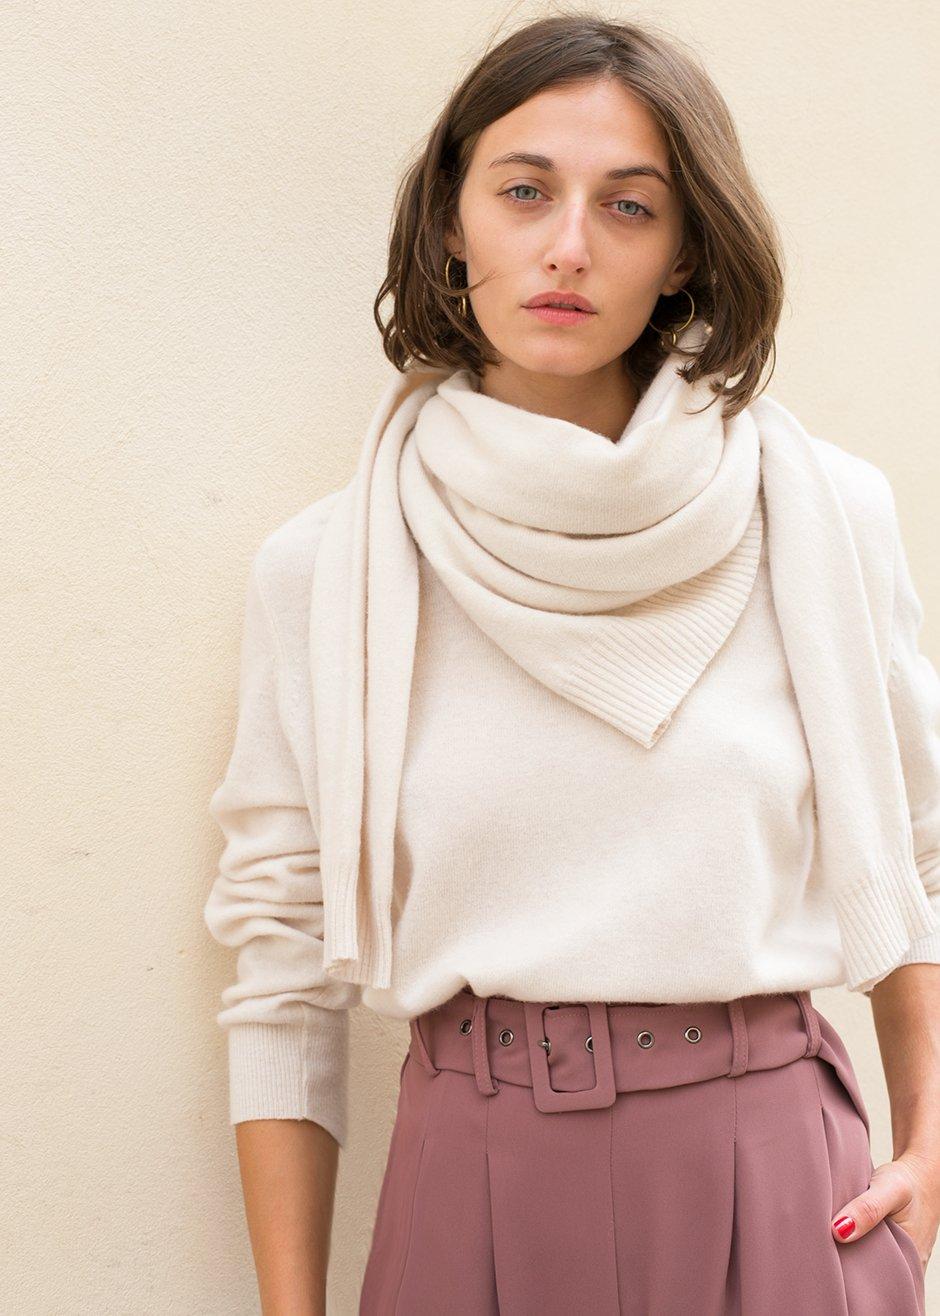 cream-knit-IMG_1689.jpg